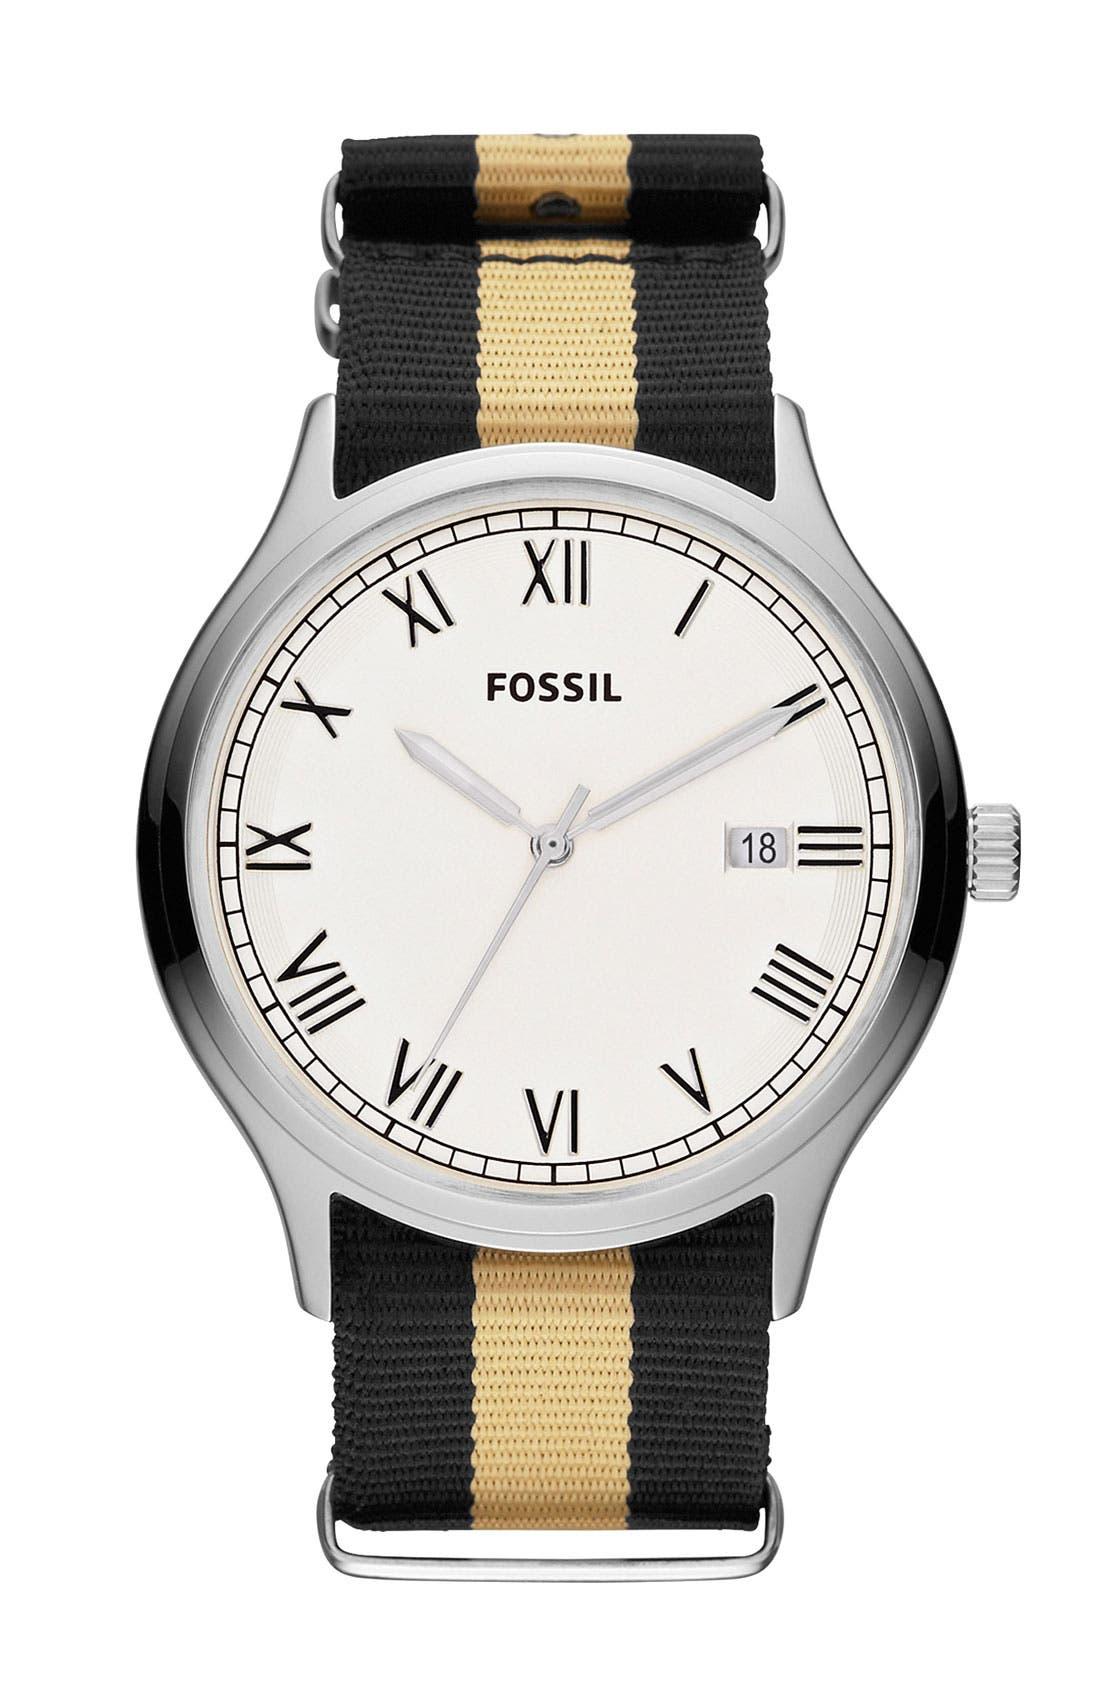 Main Image - Fossil 'Ansel' Nylon Strap Watch, 41mm